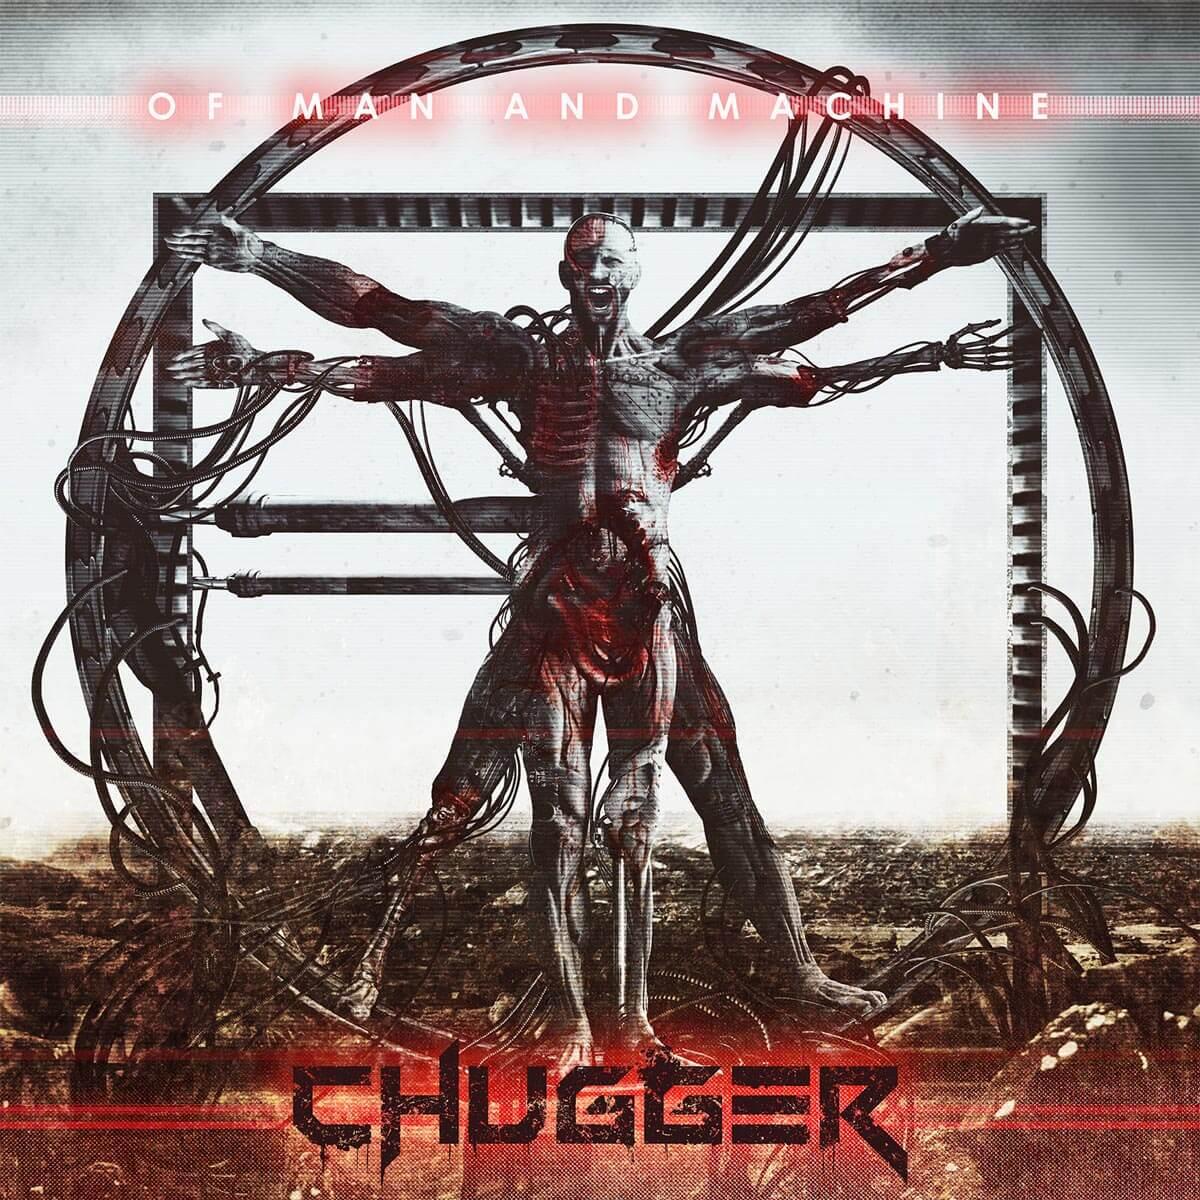 Chugger – Of Man and Machine